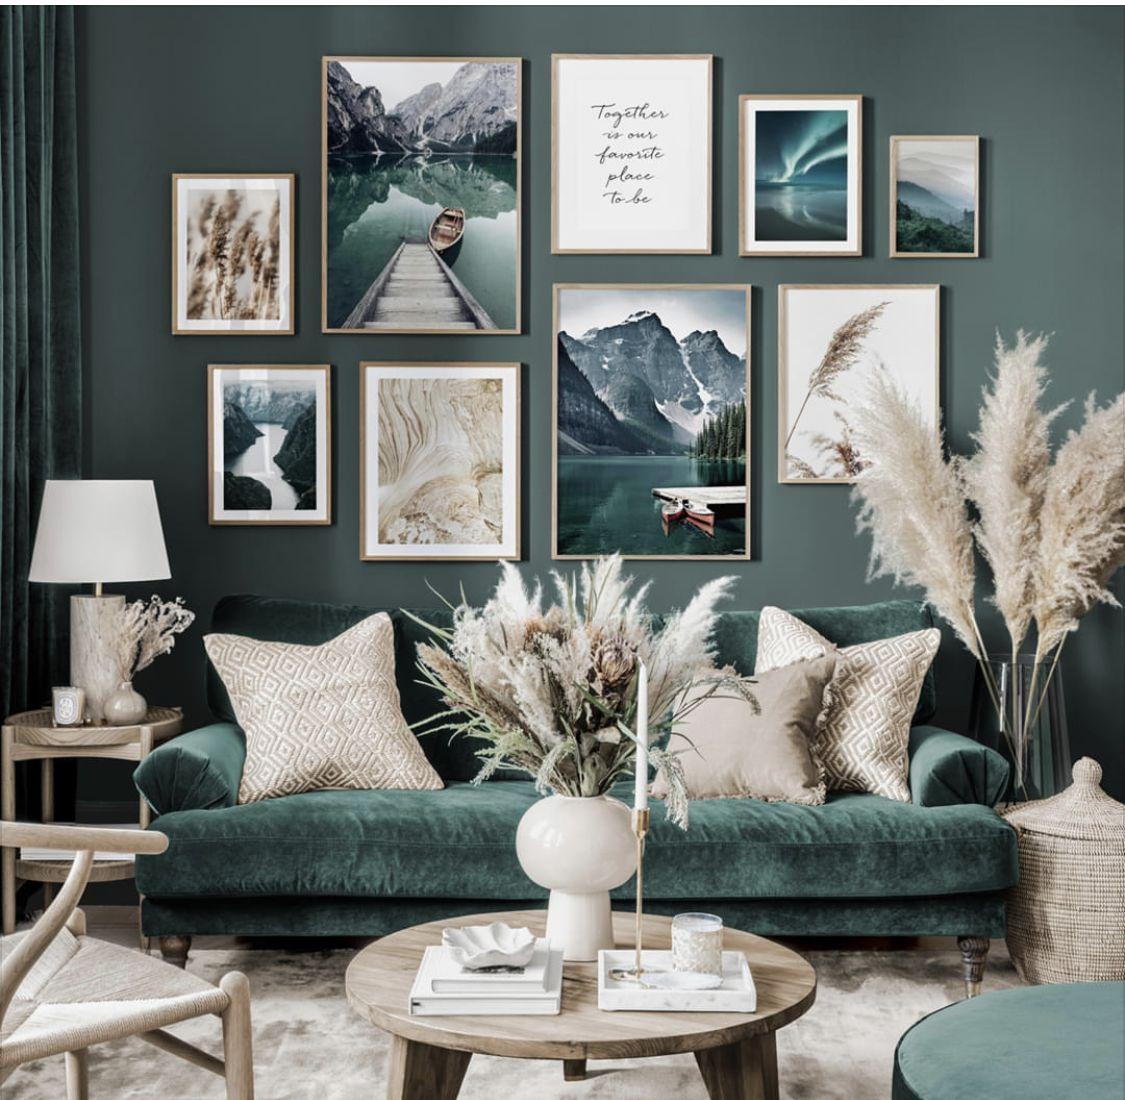 Pin By Marike Van Oostveen On Woonkamer Living Room Decor Modern Living Room Green Home Decor